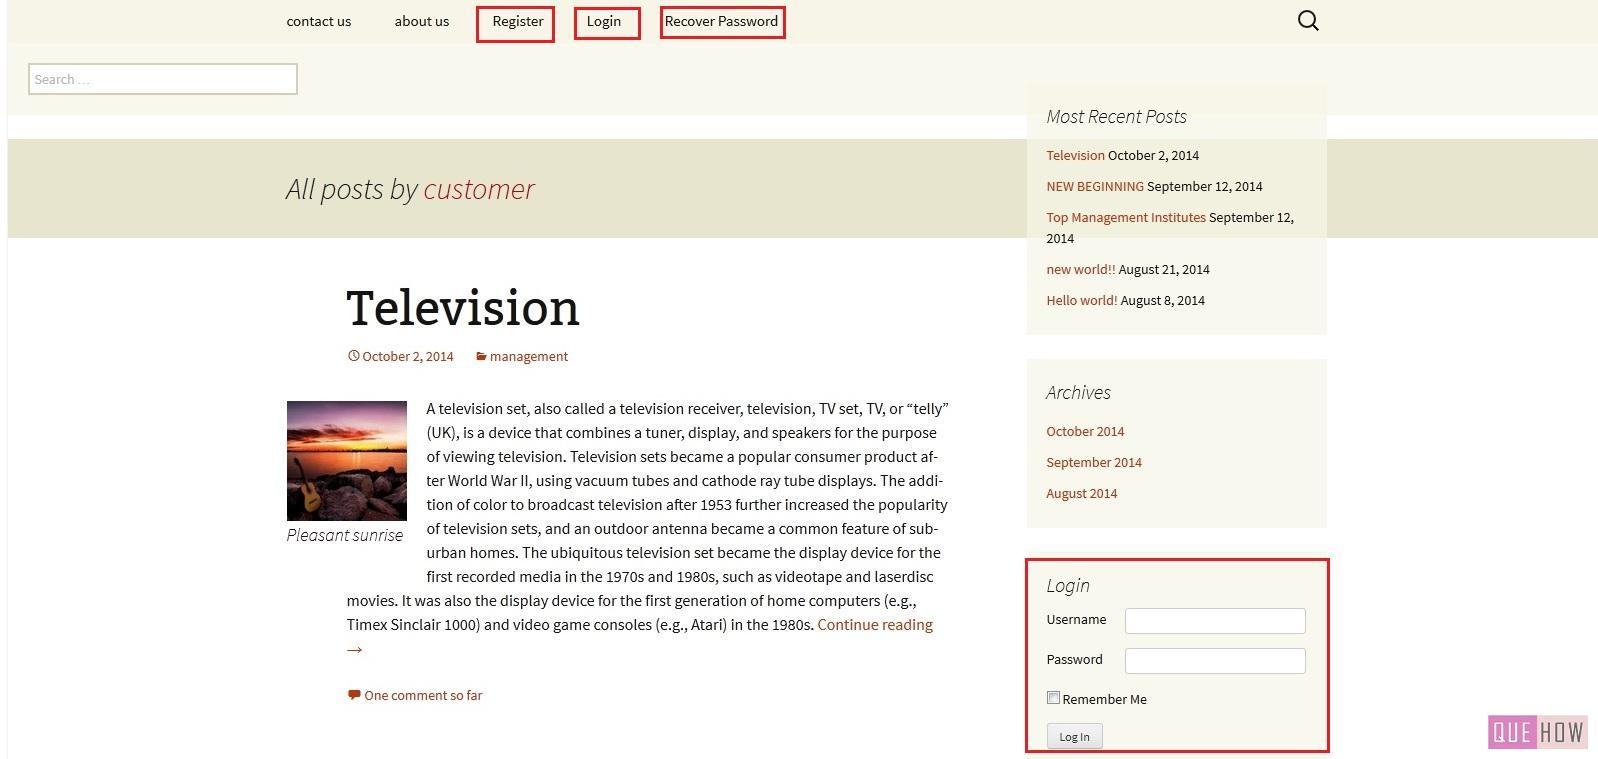 how-to-add-custom-registration-login-form-in-wordpress-using-a-plugin-step18